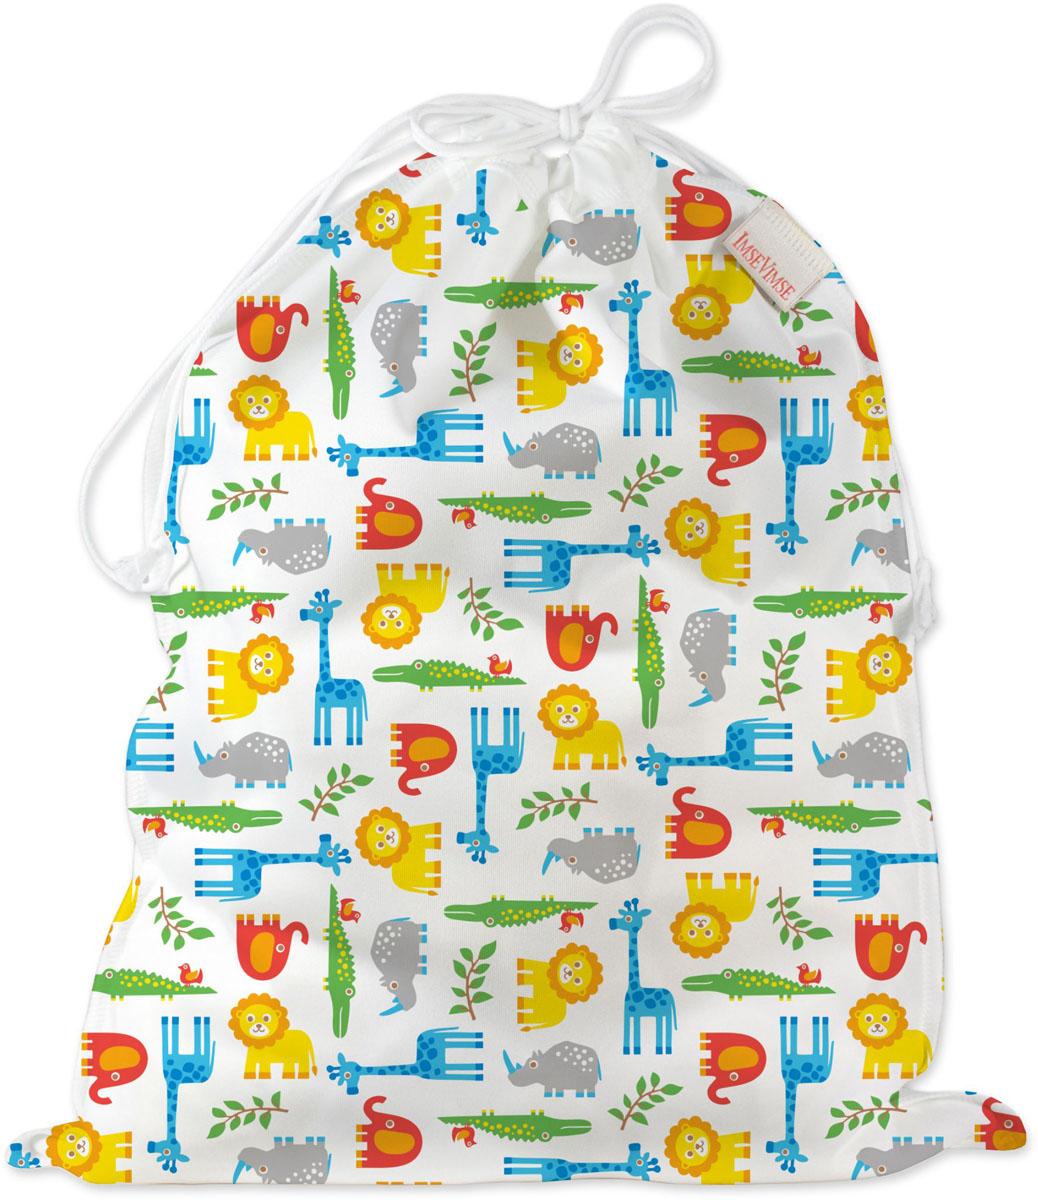 ImseVimse Водонепроницаемая сумка со шнуром Zoo imsevimse сумка цвет бежевый